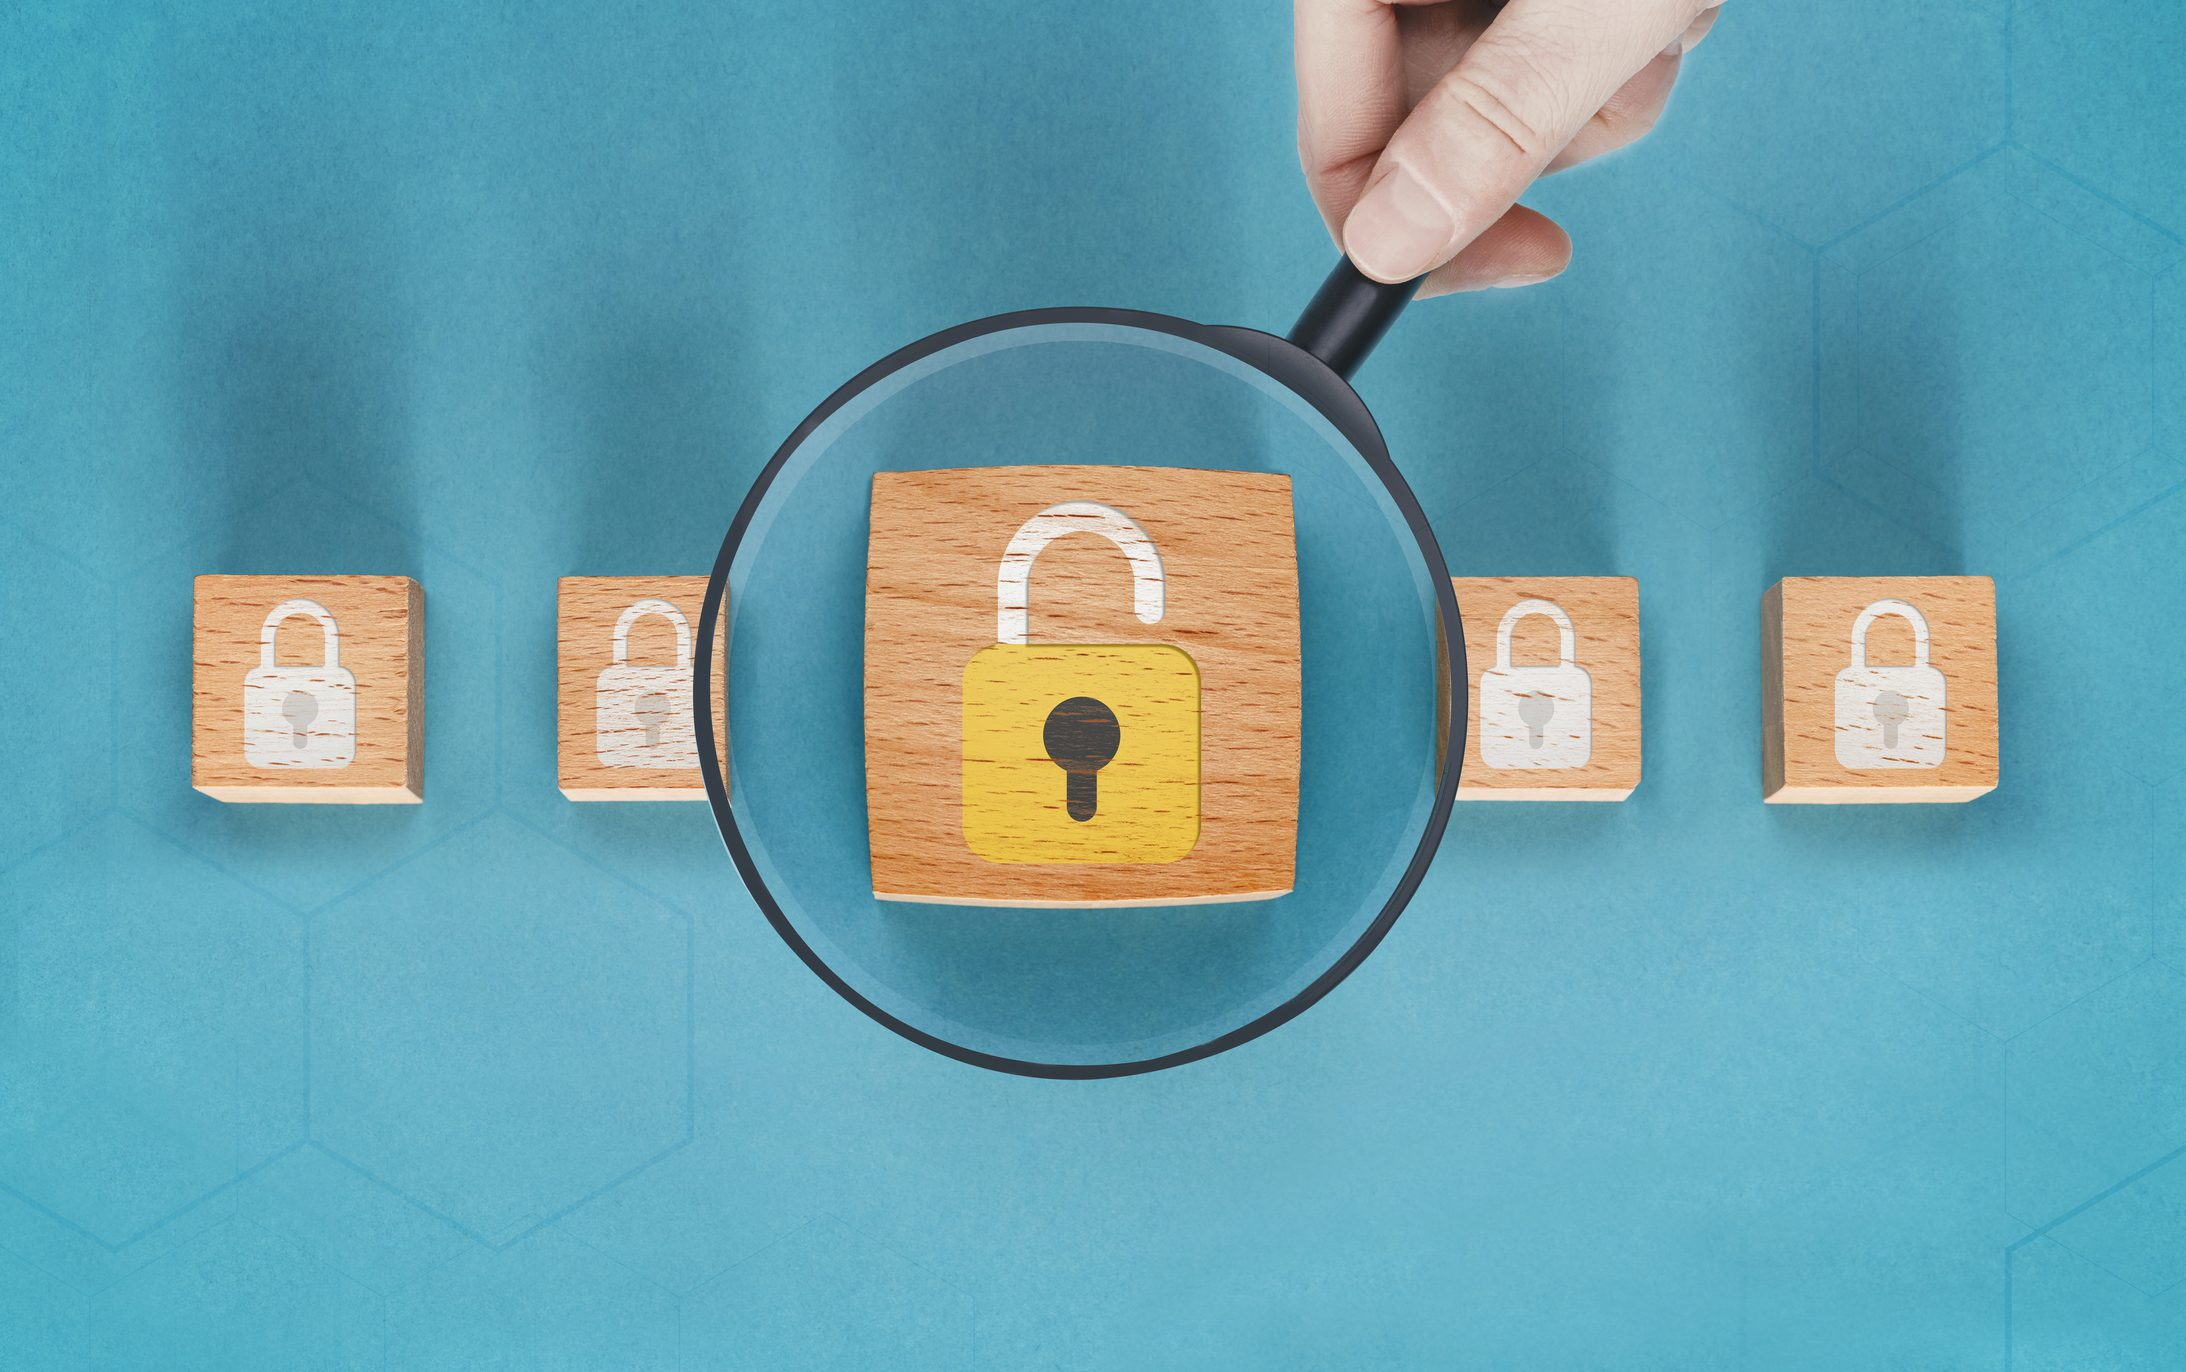 Security-Lock-Concepts